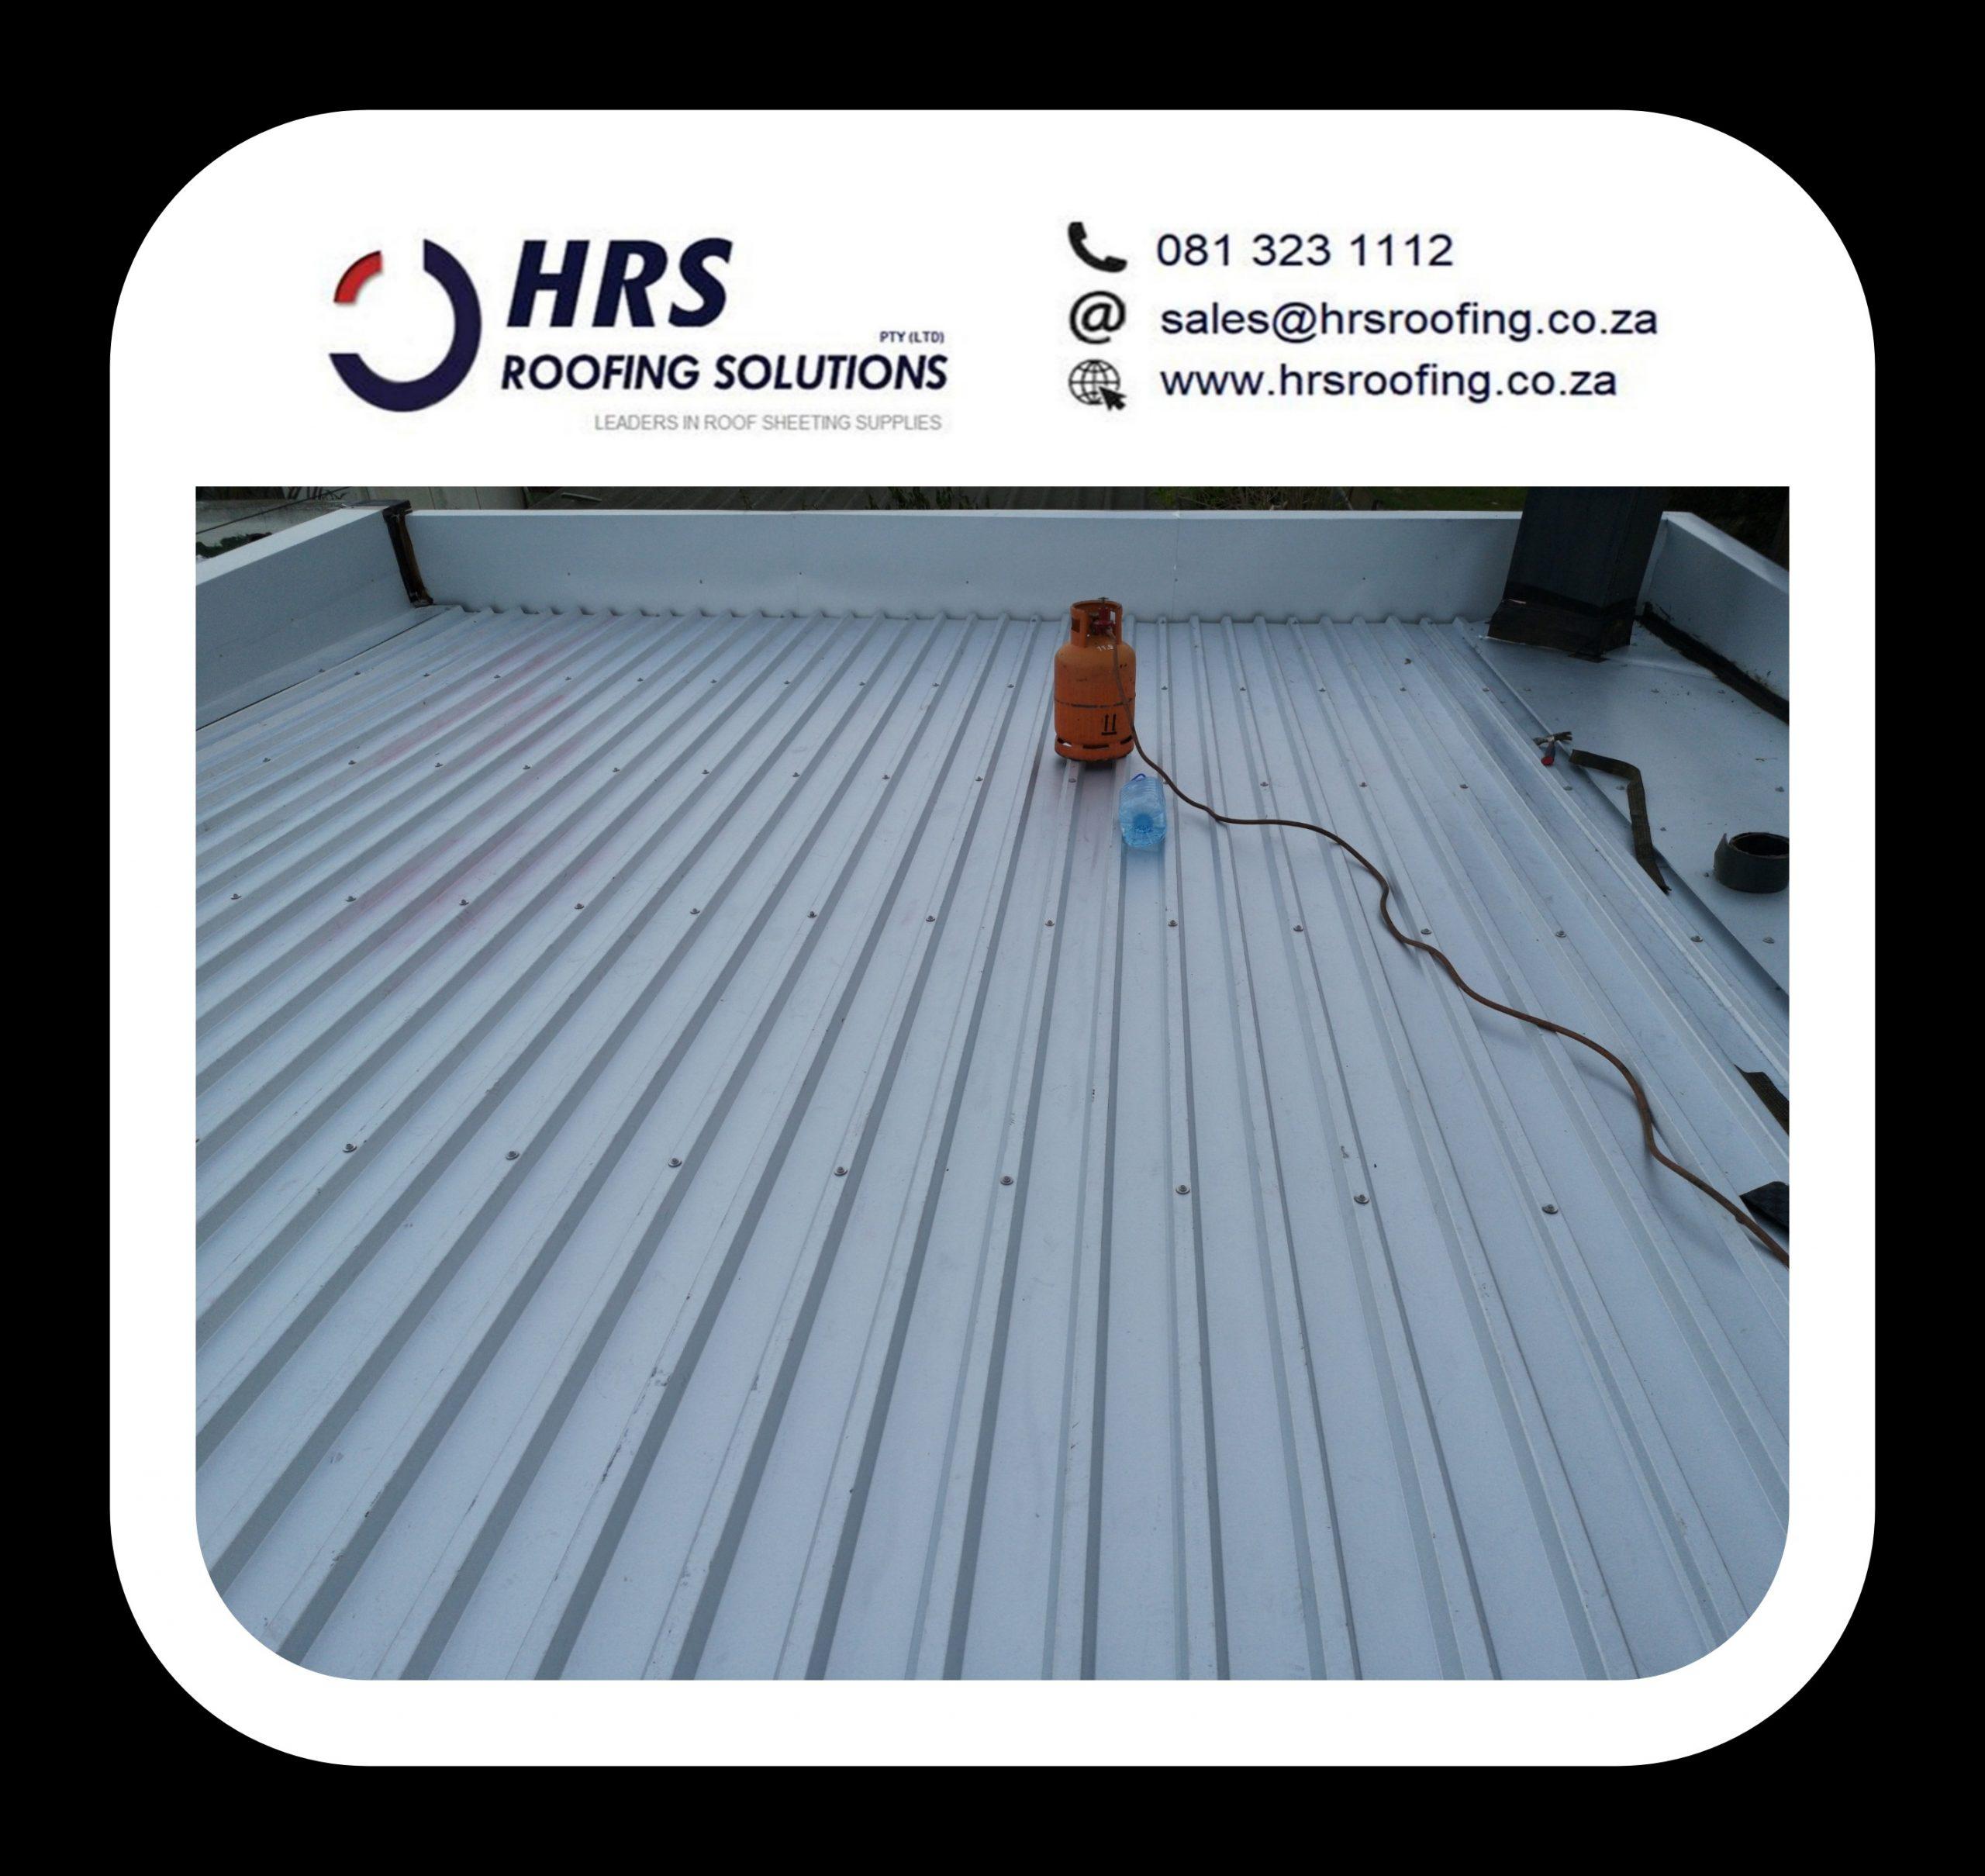 ibr ZincAL roof sheeting Corrugated az 150 george Caledon montagu cape Town